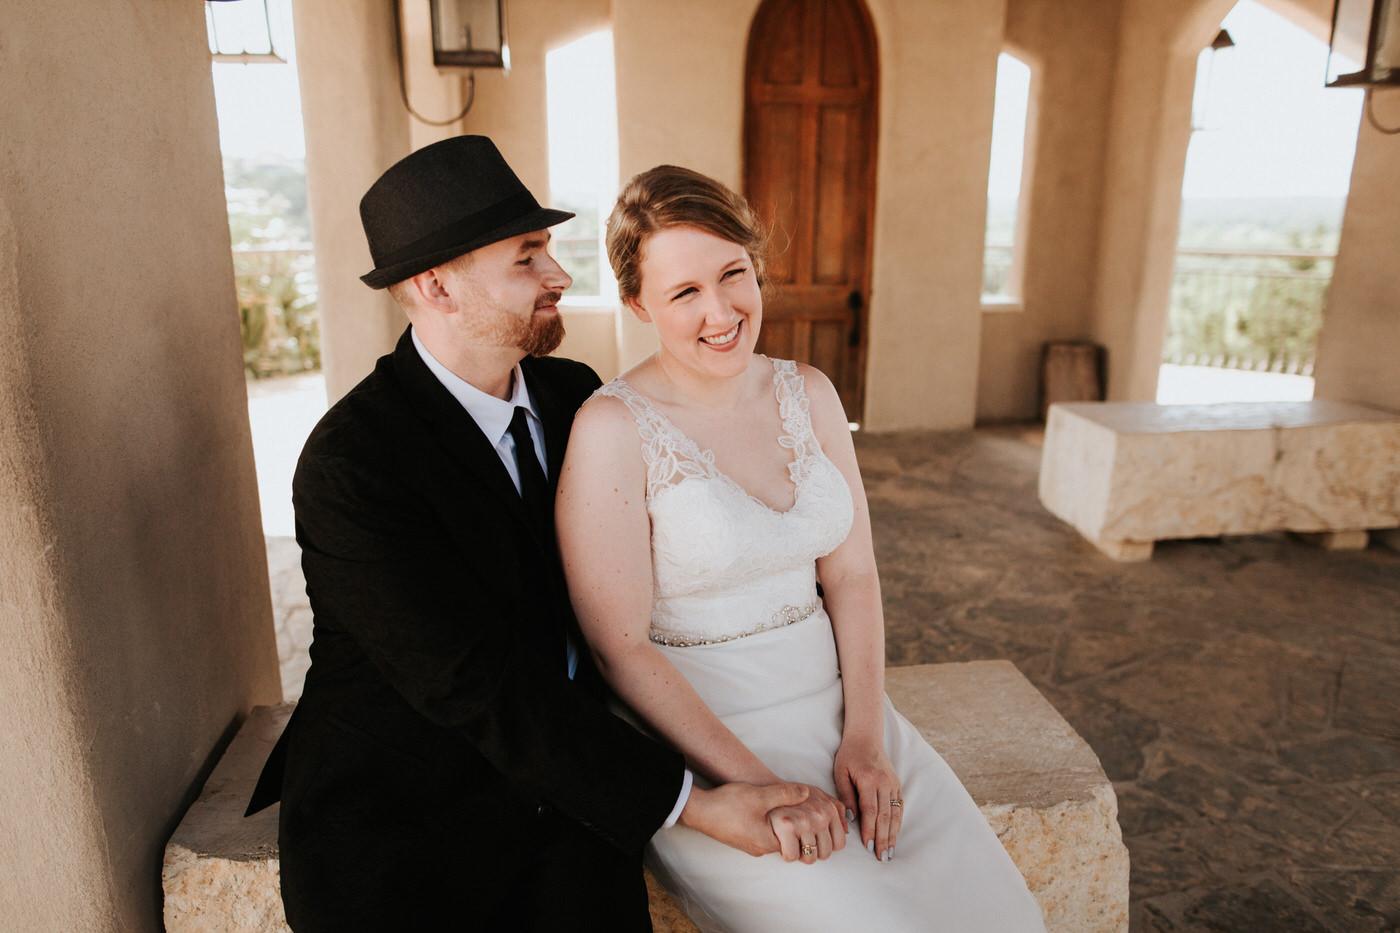 Chapel Dulcinea Elopement Wedding - Diana Ascarrunz Photography-233.jpg